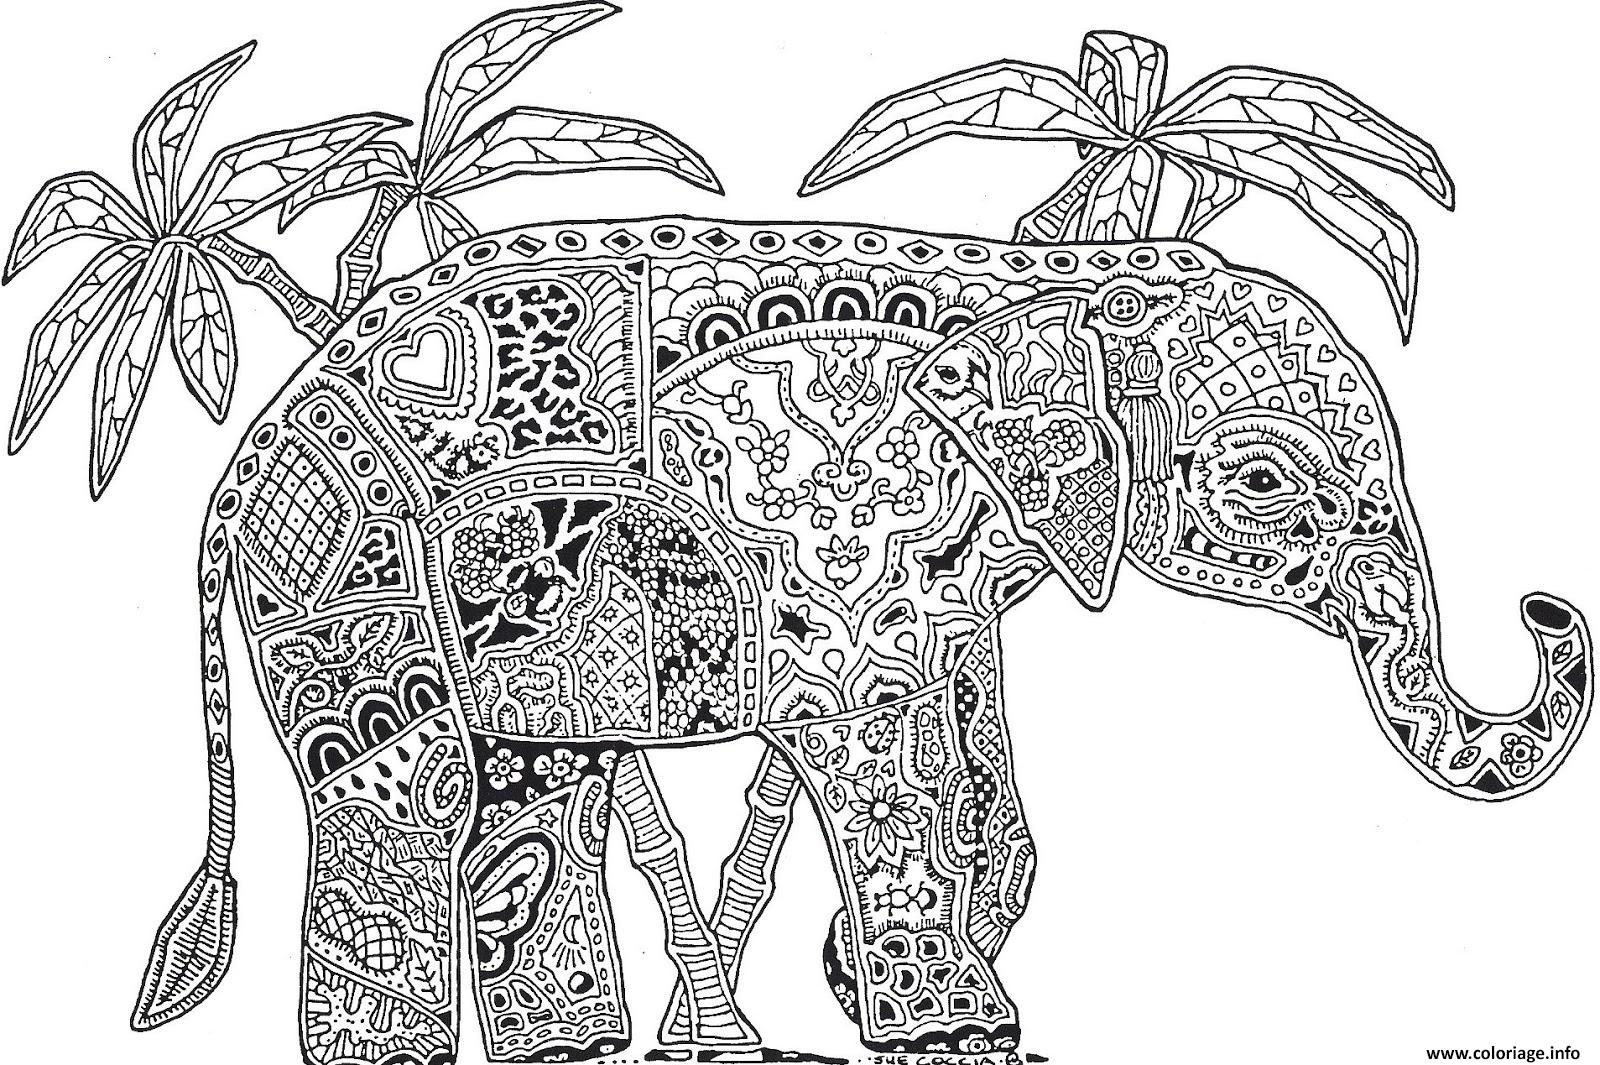 Coloriage Adulte Animaux Elephant Difficile Dessin